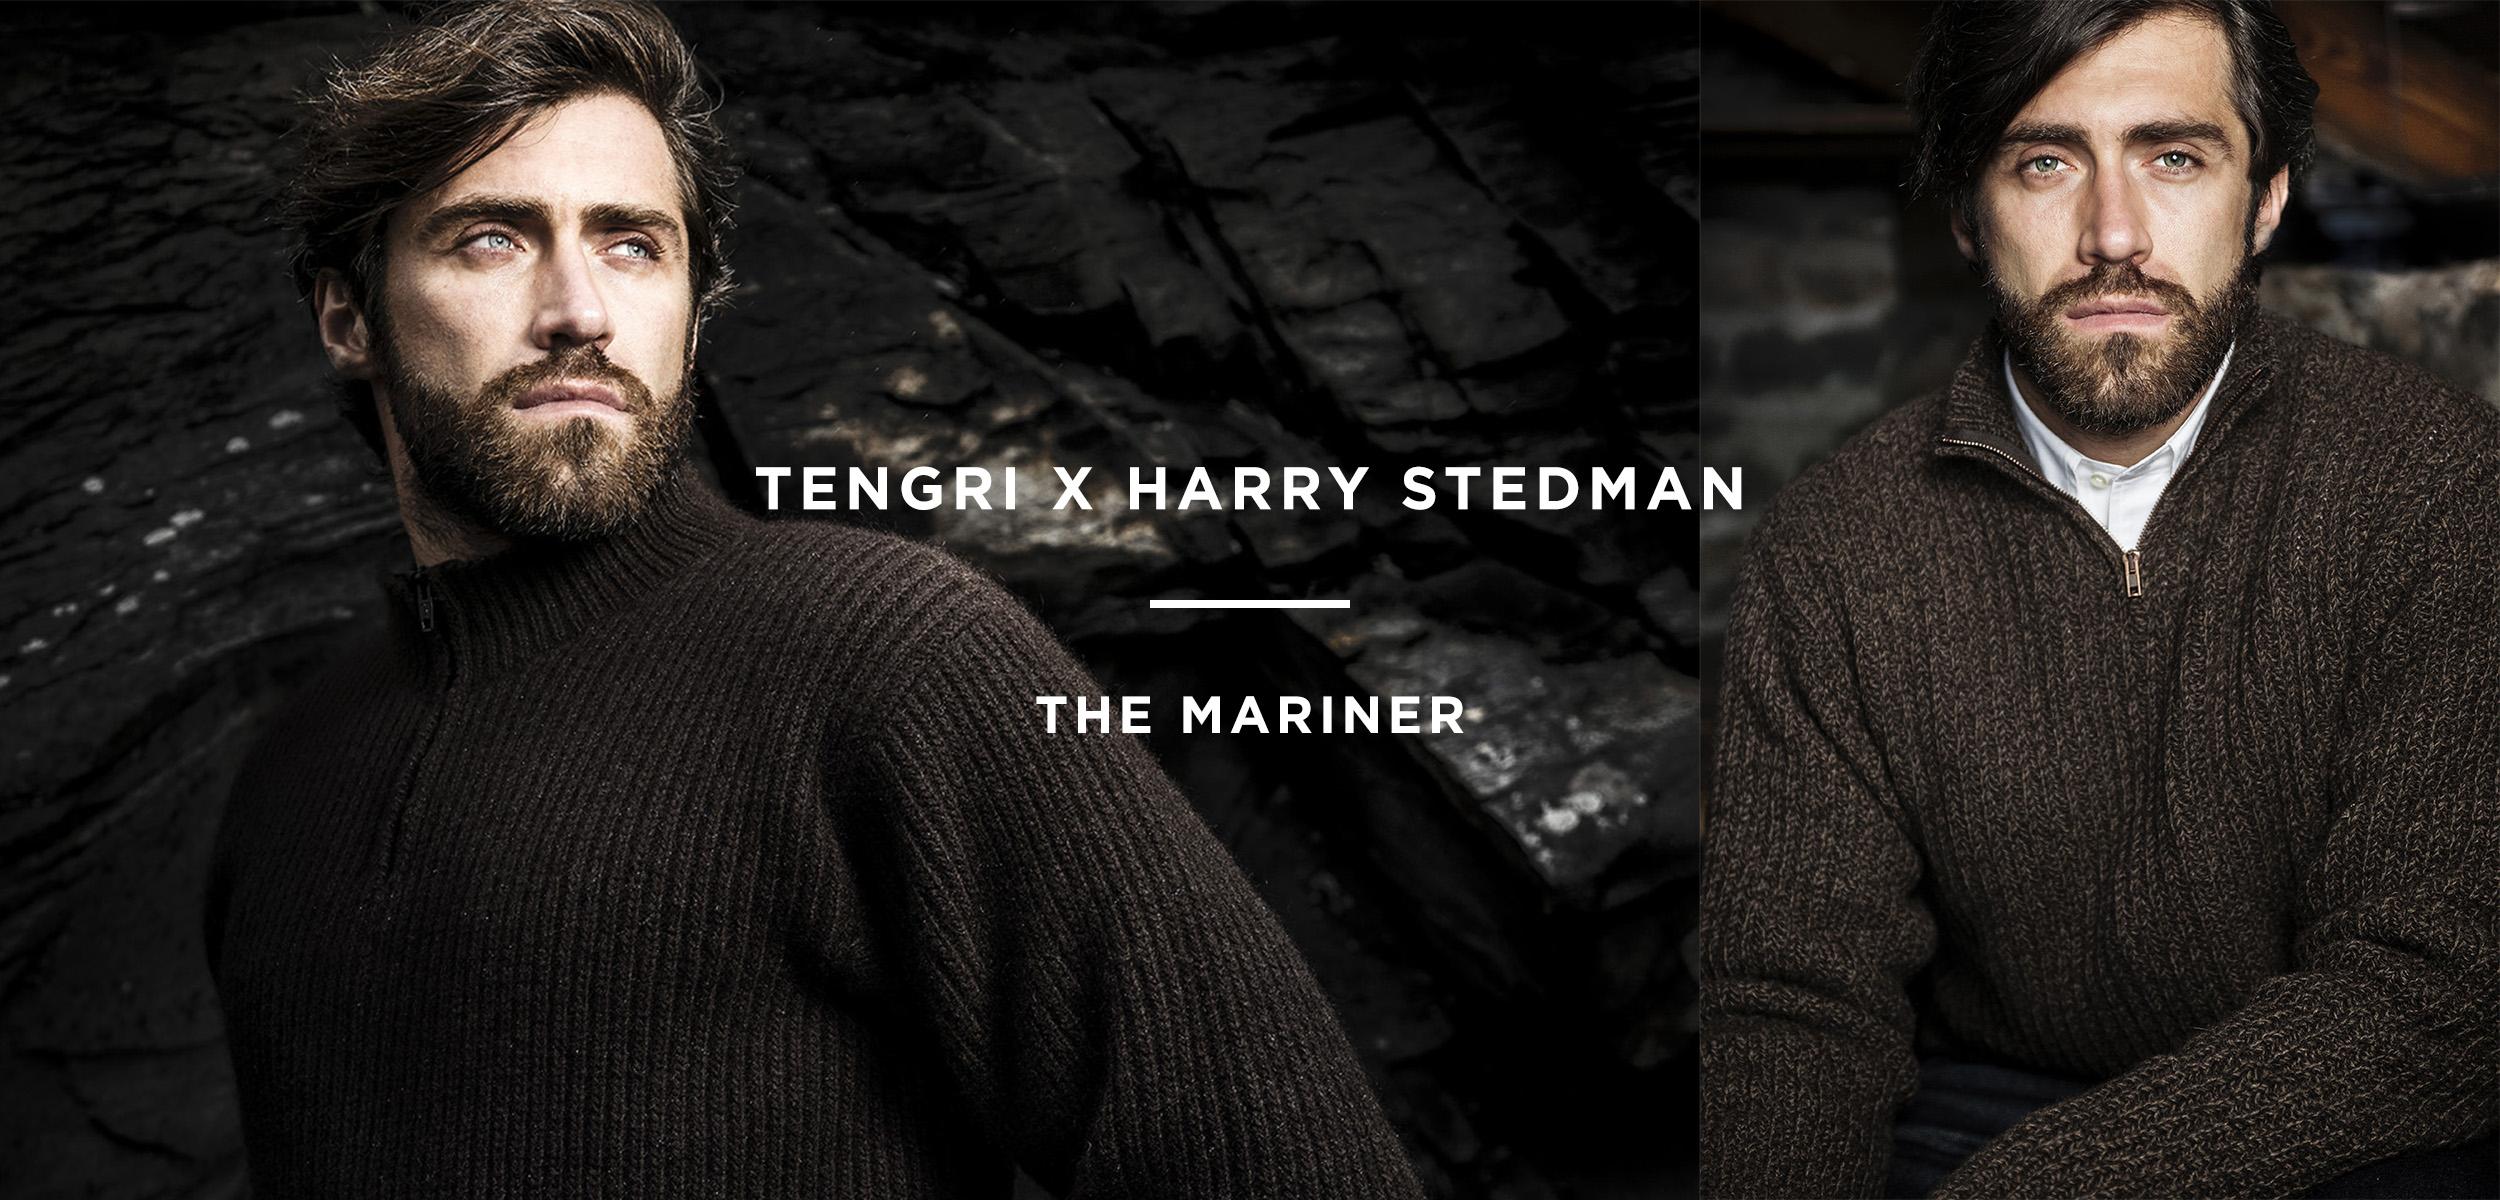 Tengri_x_Harry-Stedman_The_Mariner.jpg